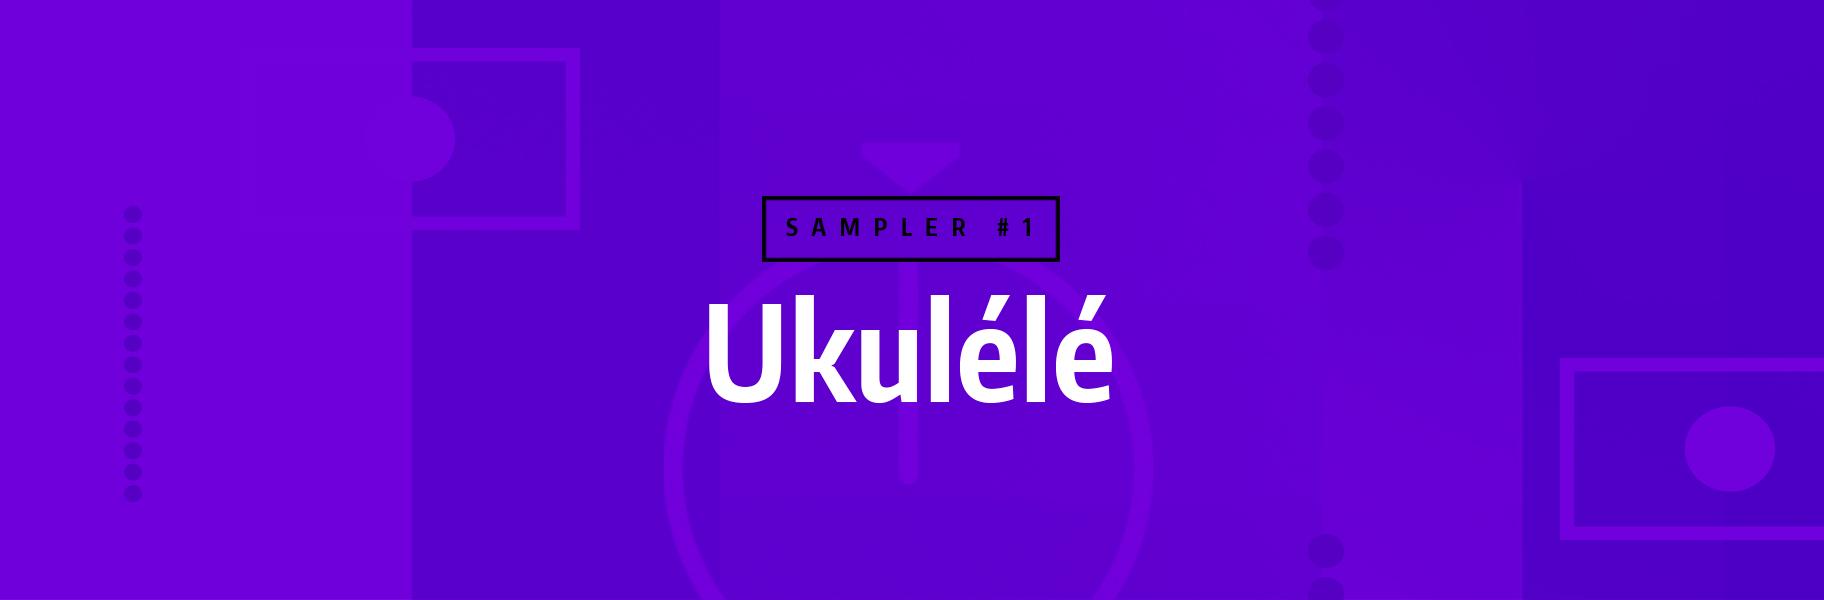 Sampler Instrument #1 - Ukulélé